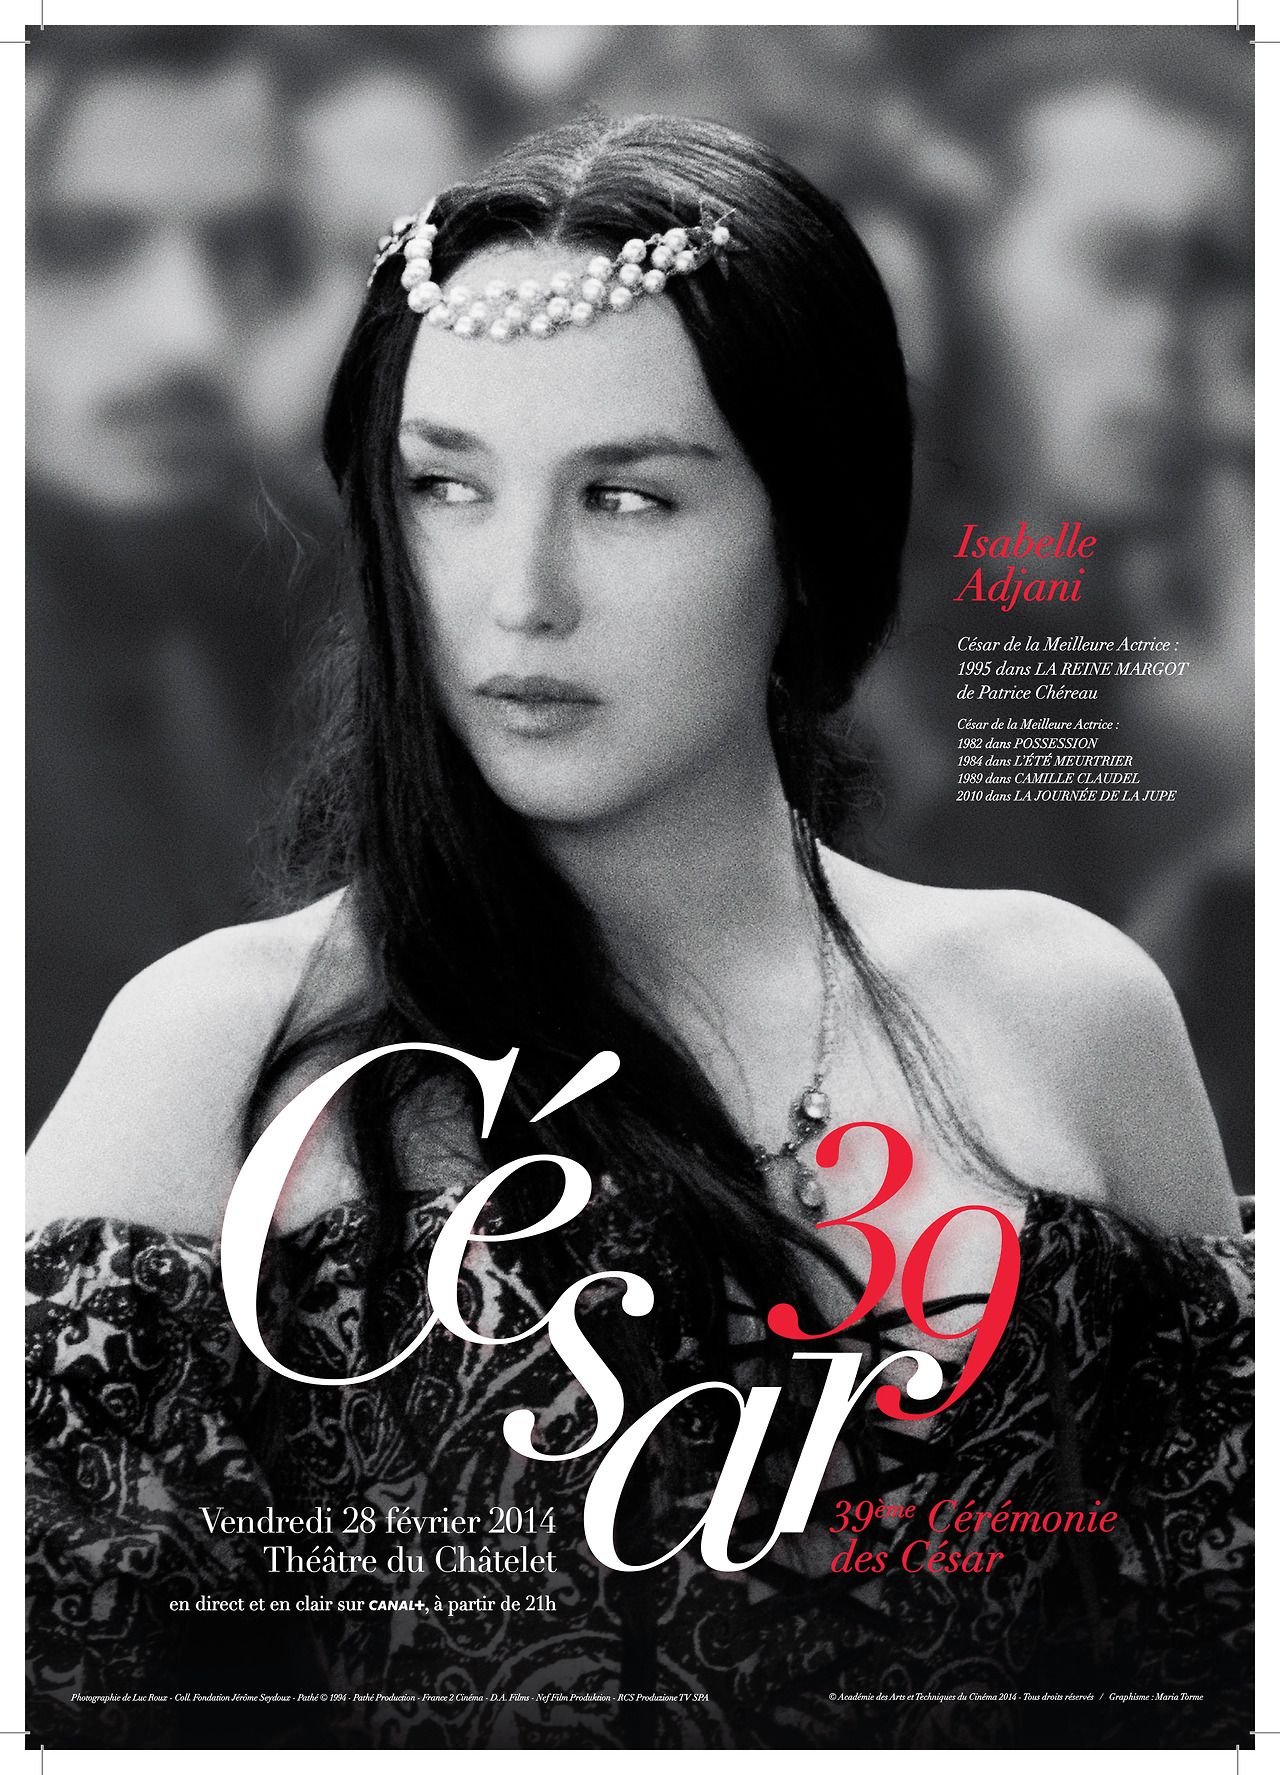 39th c sar 2014 poster with isabelle adjani queen margot la reine margot 1994 actors and. Black Bedroom Furniture Sets. Home Design Ideas